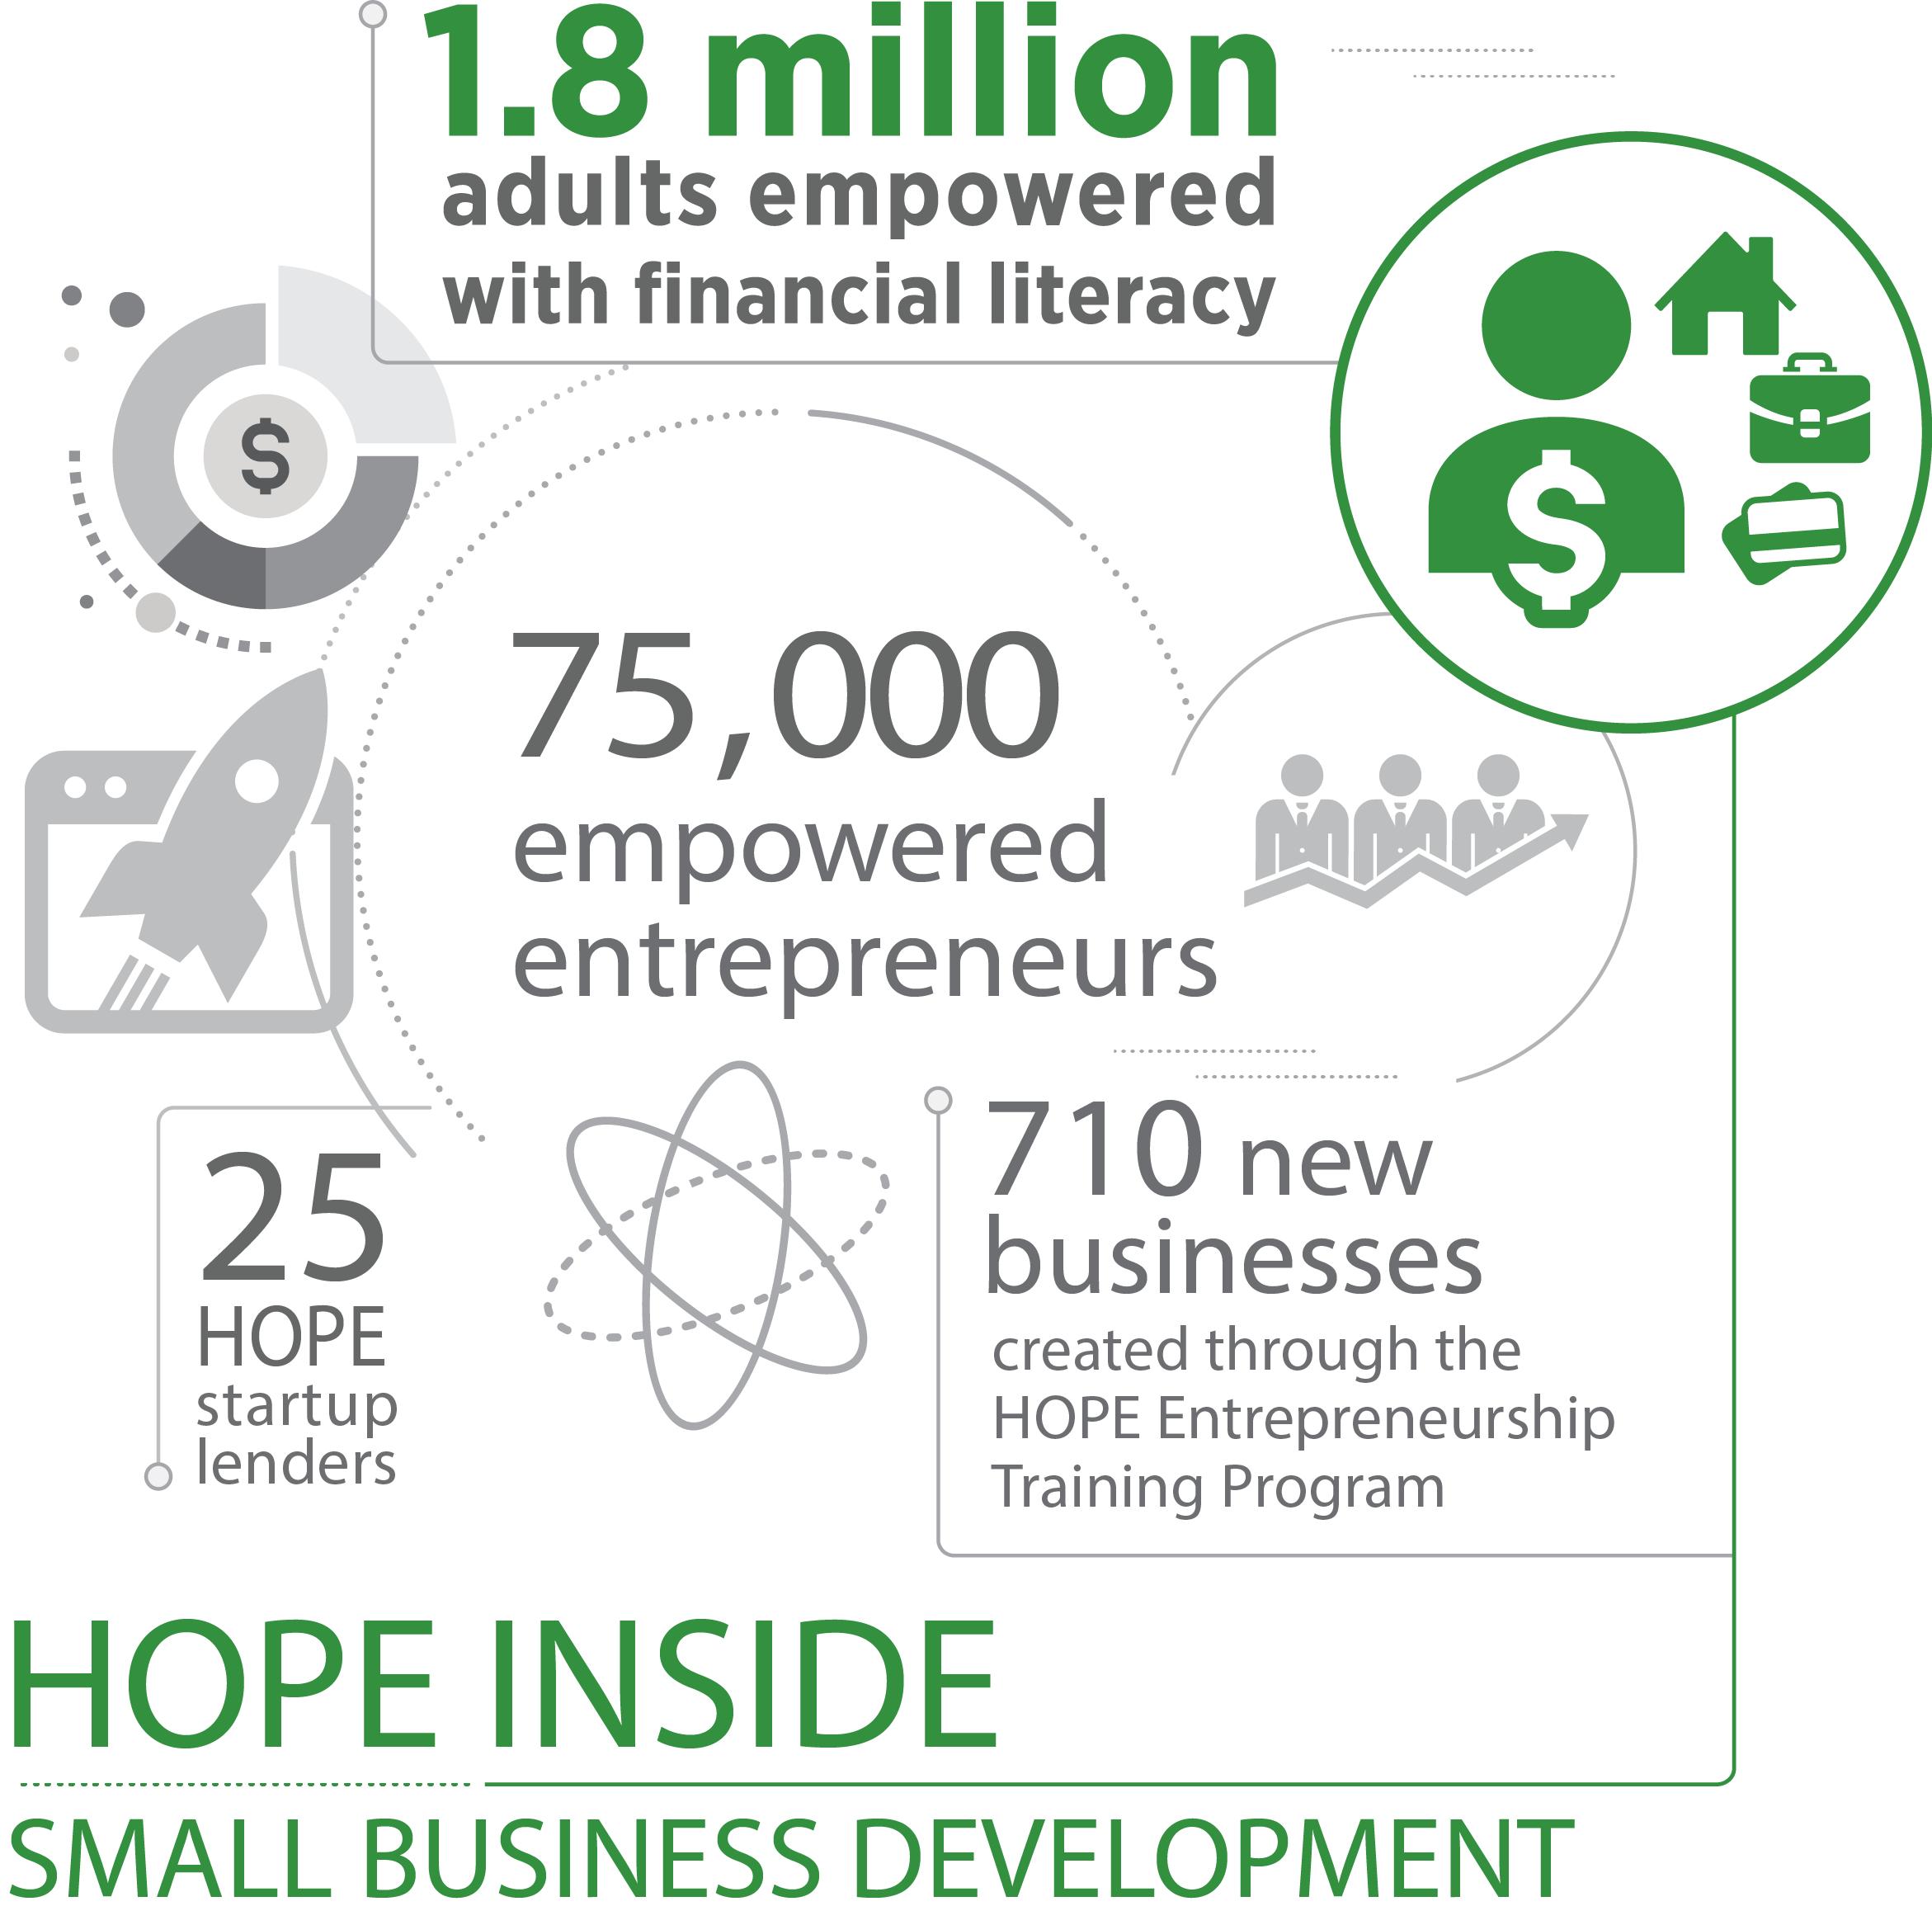 Small Business Development | Operation HOPE, Inc